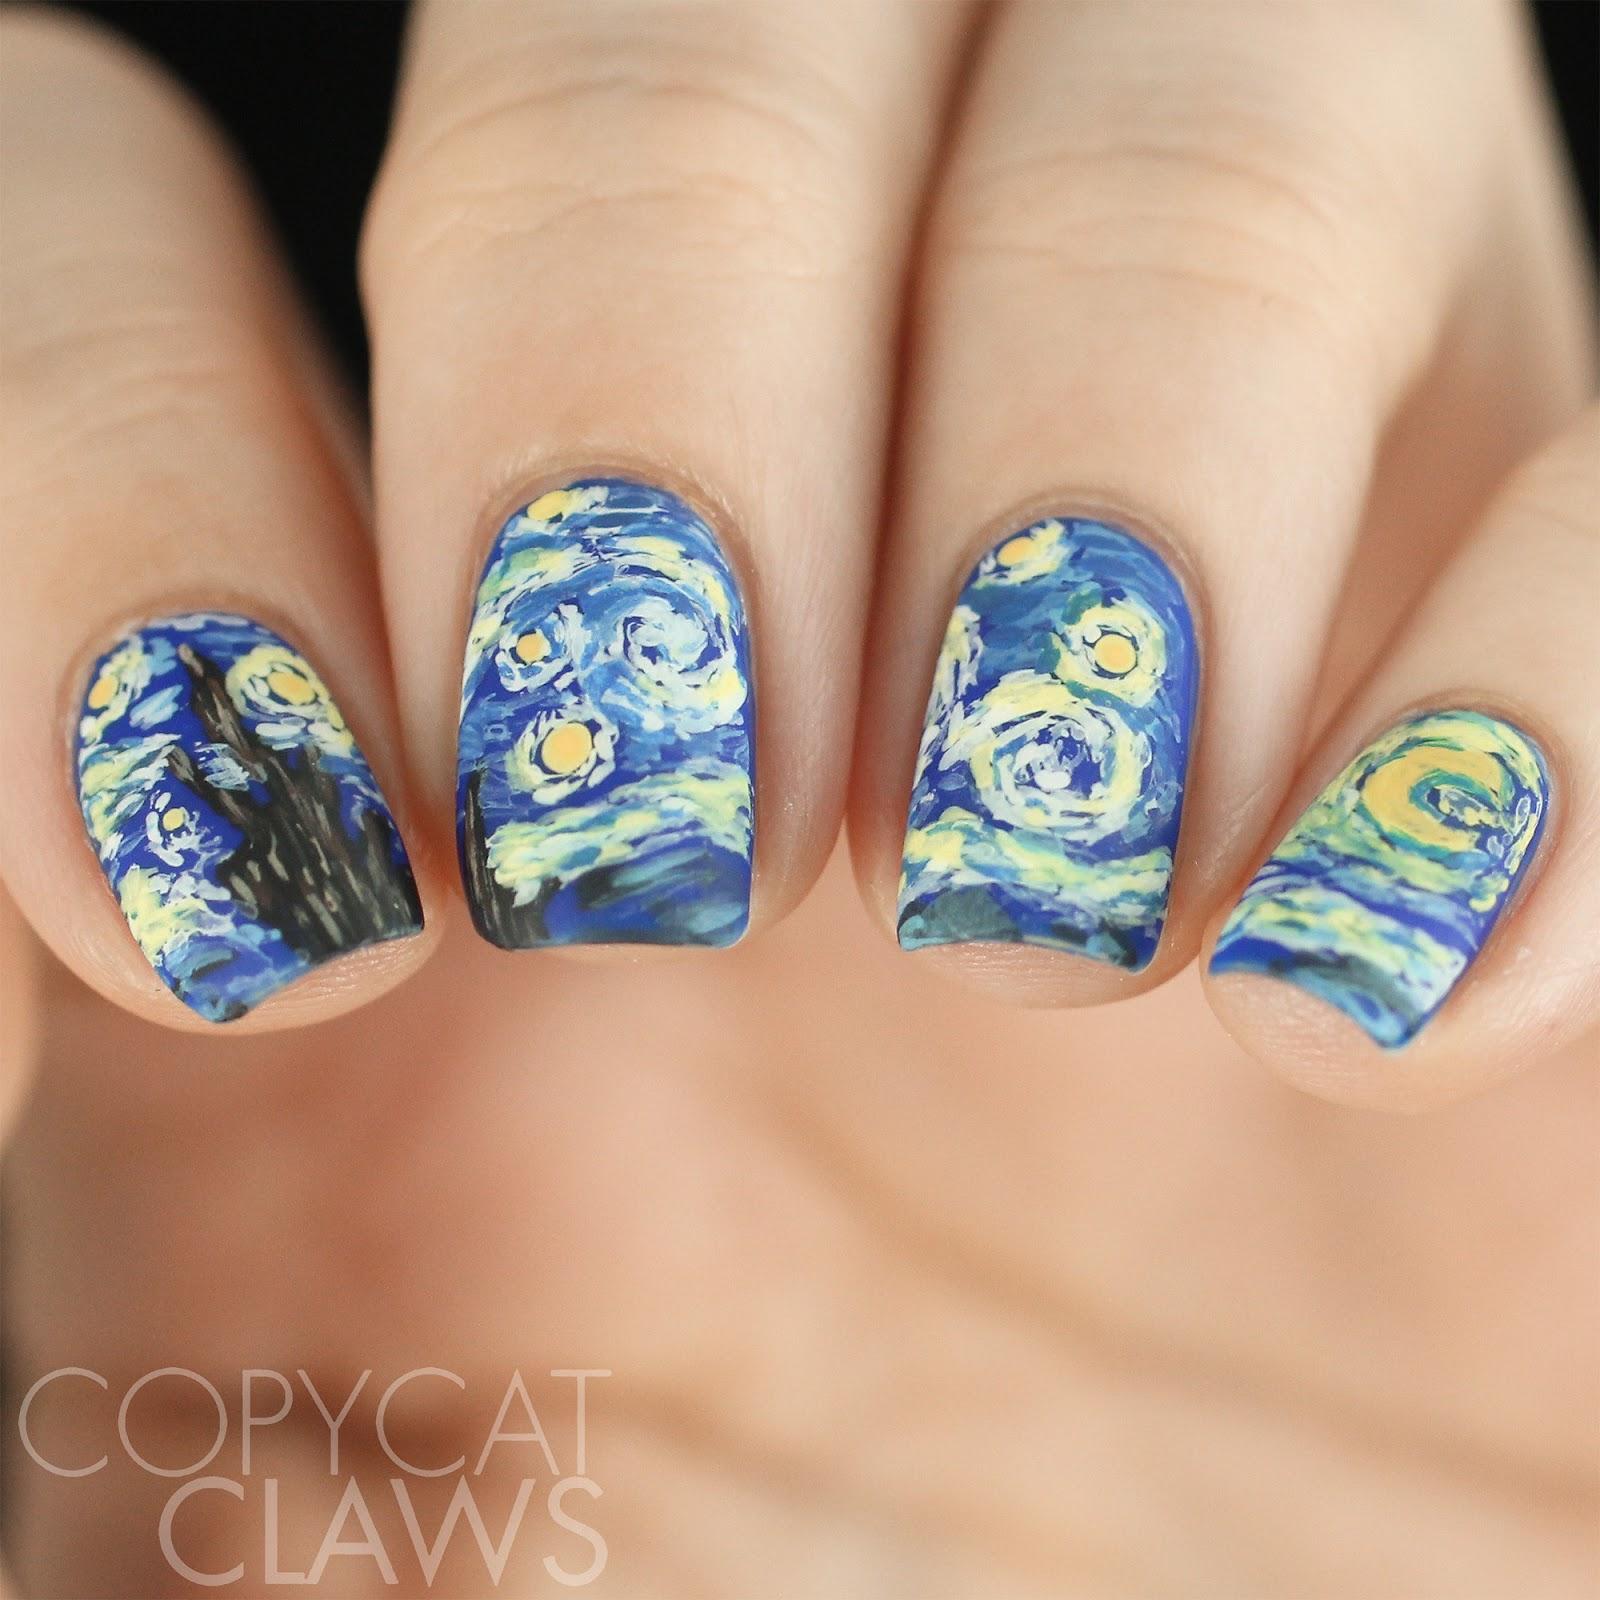 Copycat Claws The Digit Al Dozen Redoes Art The Starry Night